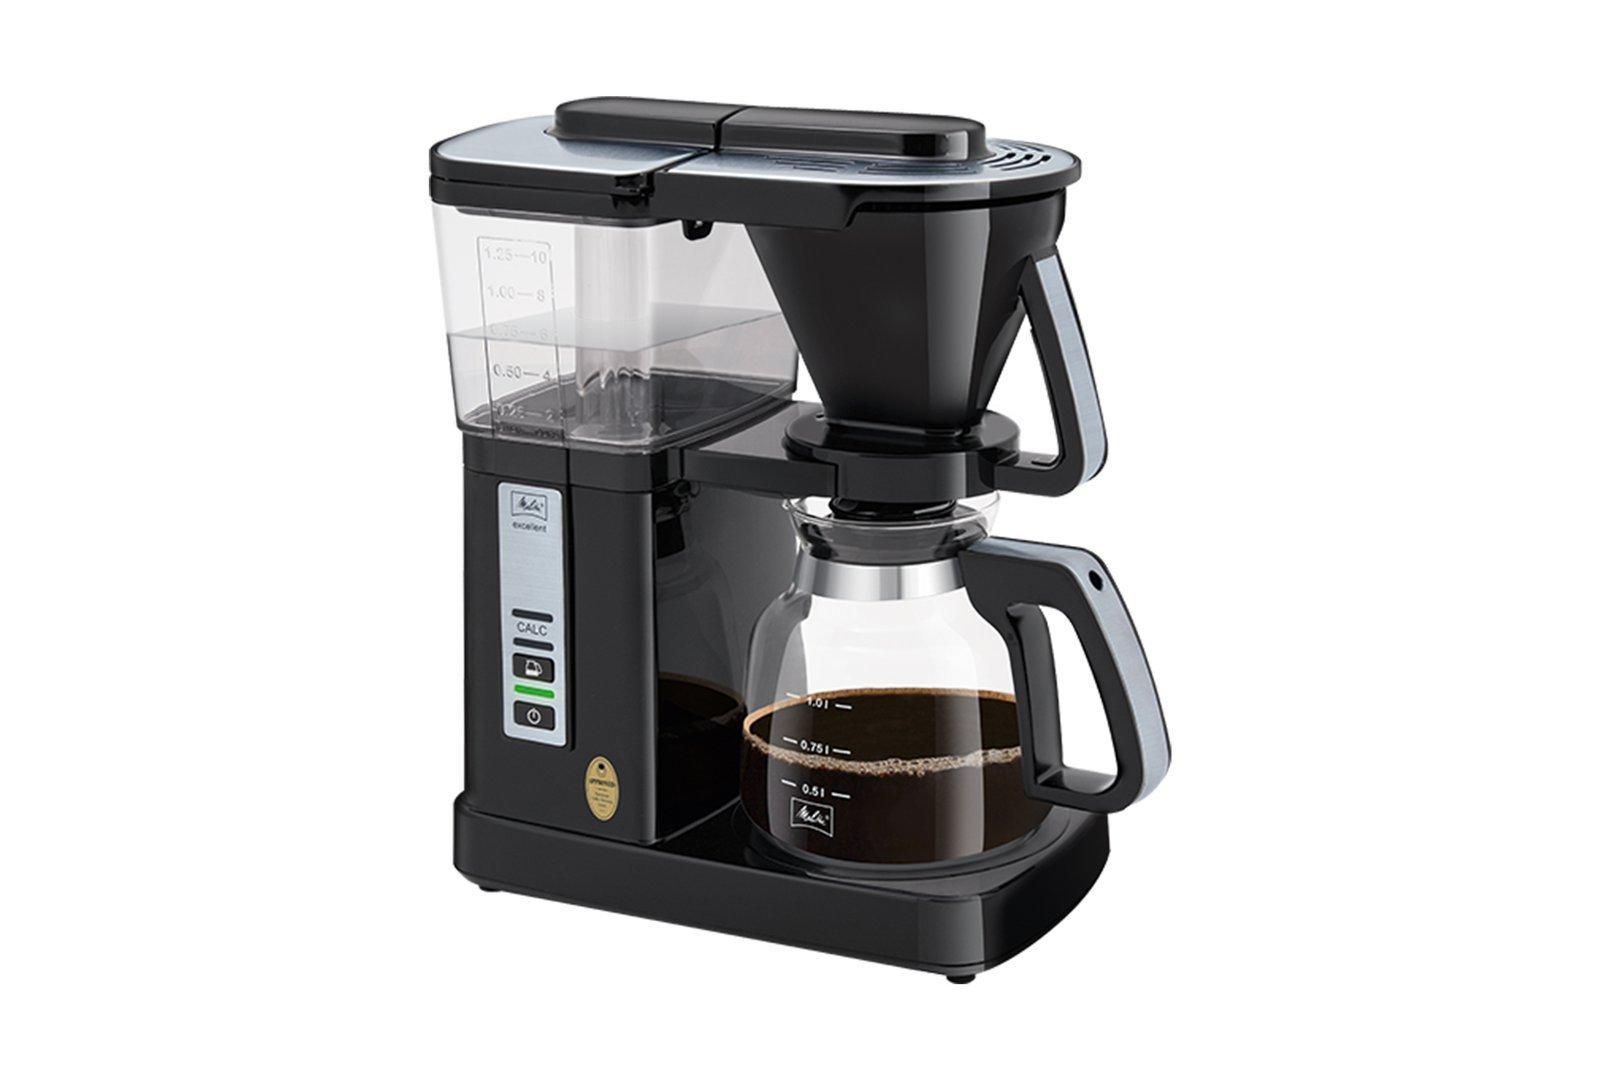 Filter coffee machine Melitta Excellent 5.0 Deluxe